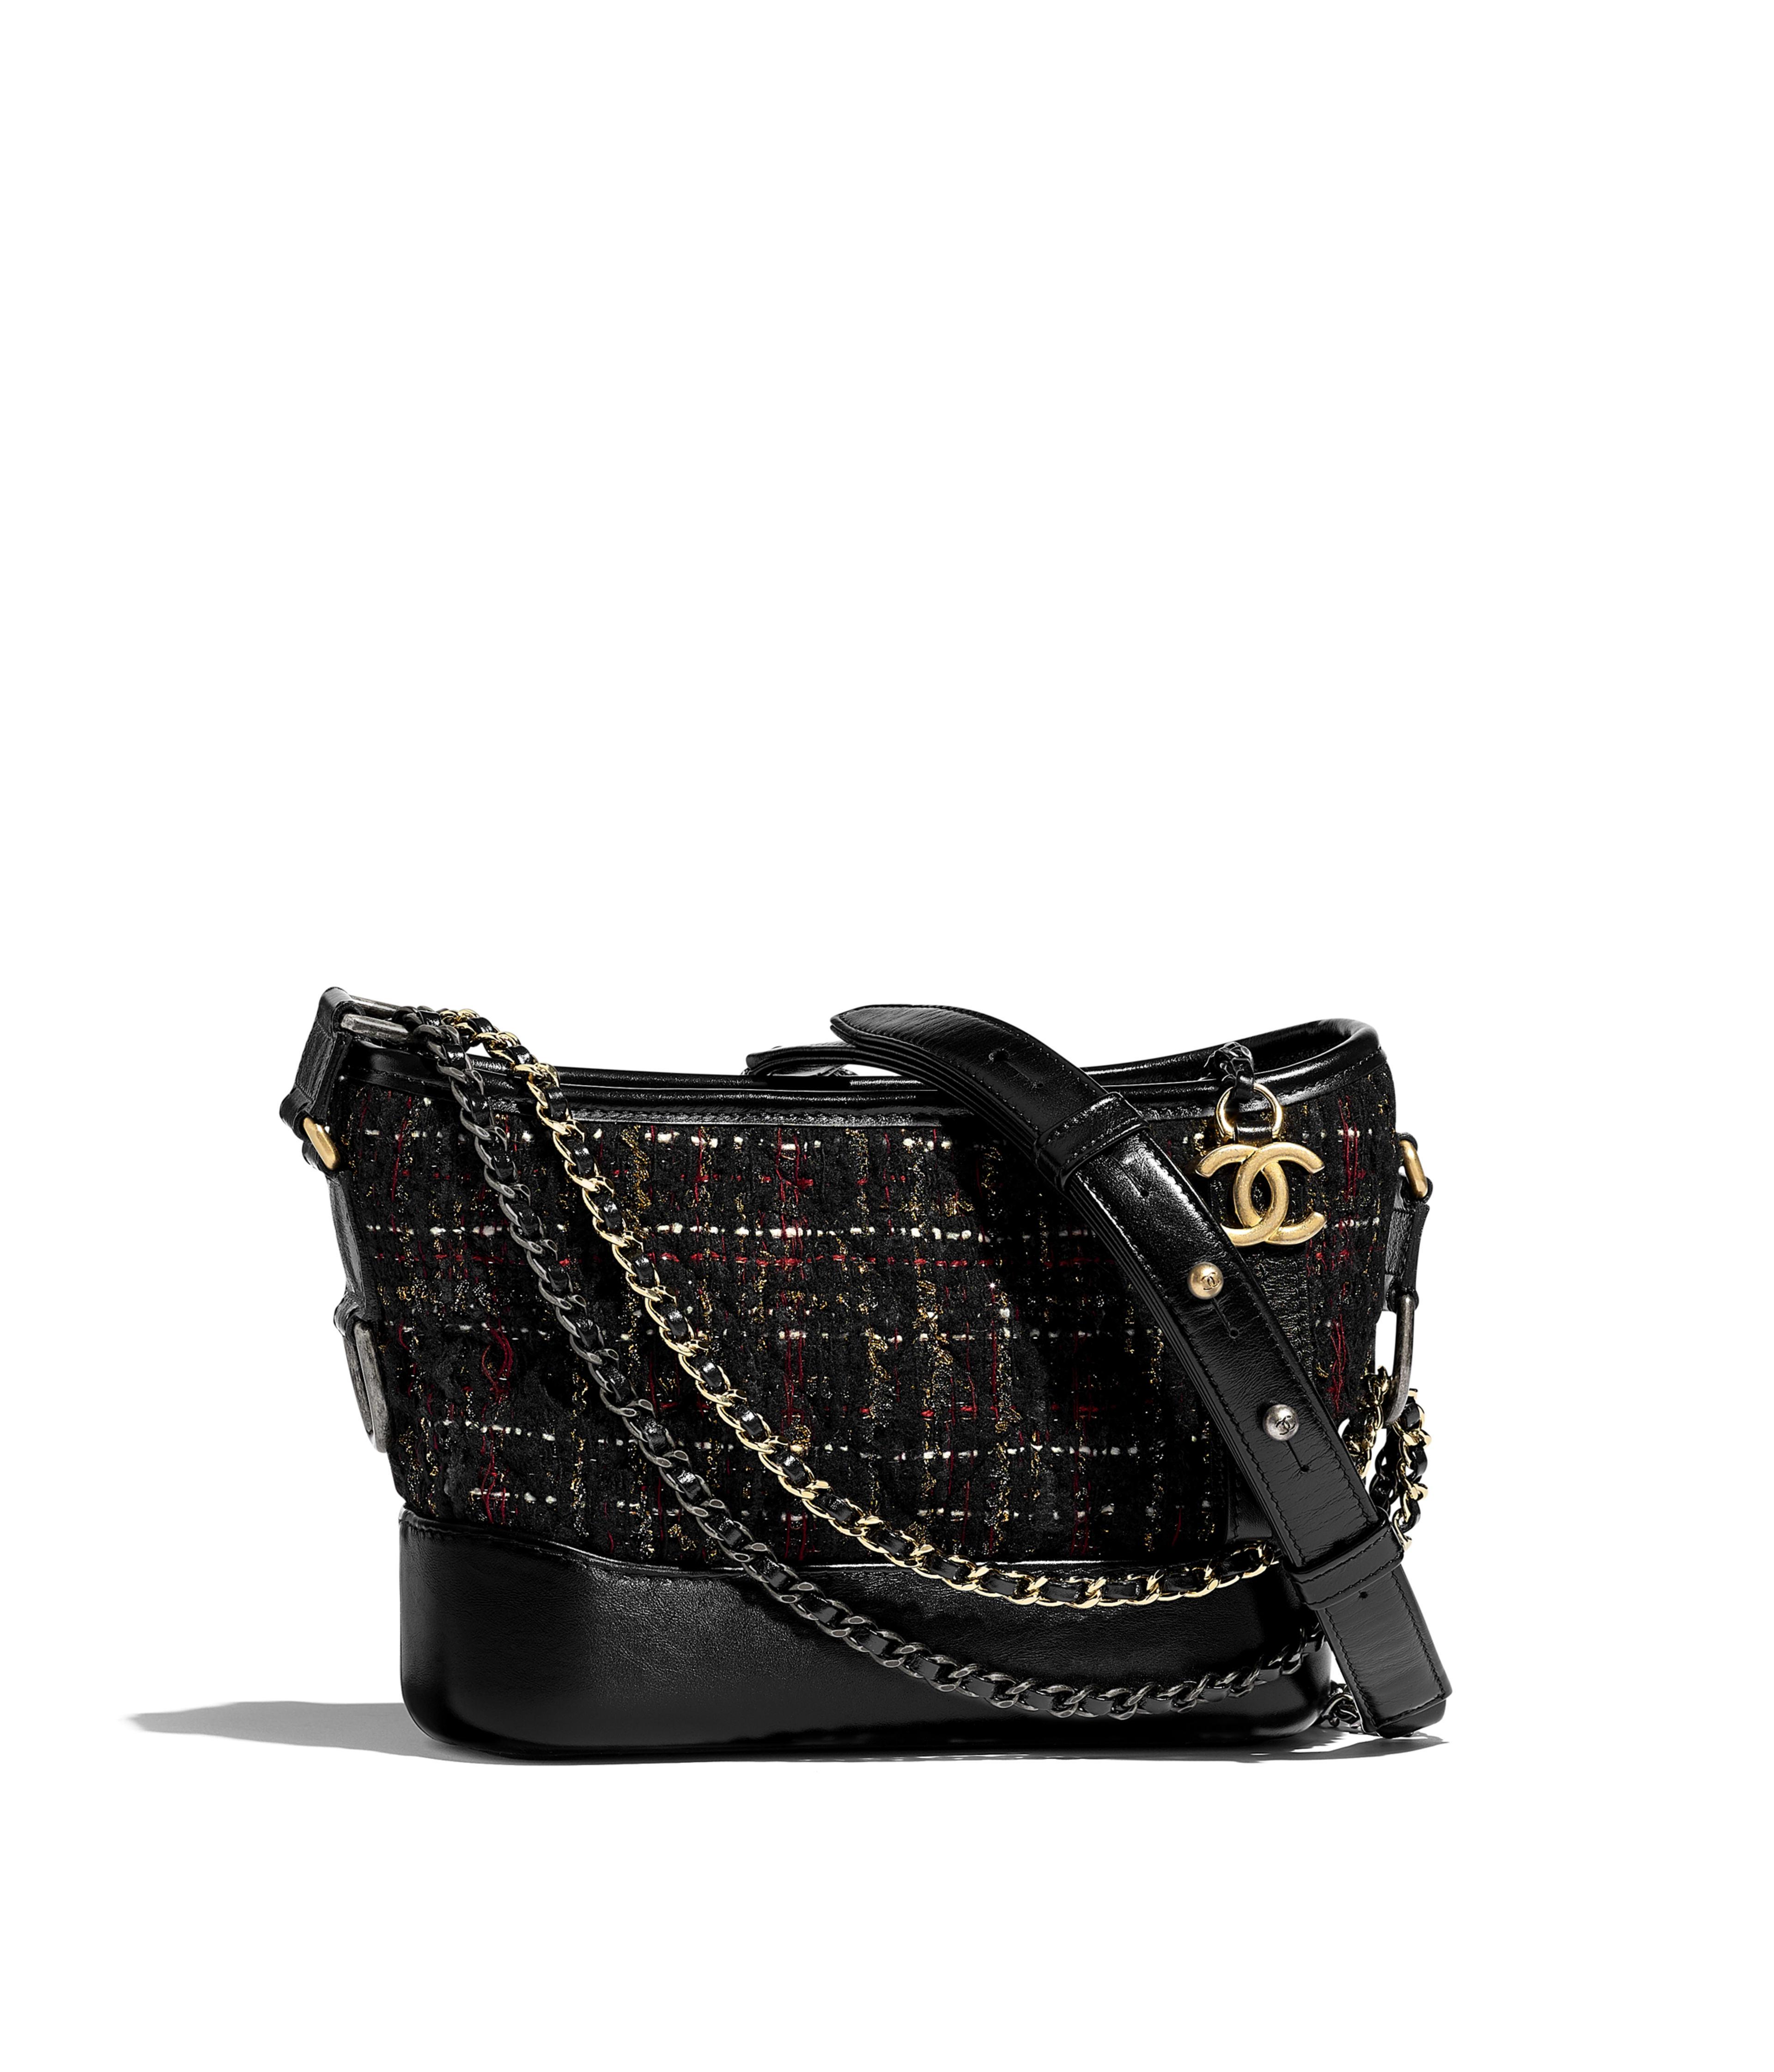 b477a926511fb2 CHANEL'S GABRIELLE Small Hobo Bag Tweed, Calfskin, Gold-Tone & Silver-Tone  Metal, Black, Red, Gold & Ecru Ref. A91810B00907N4781